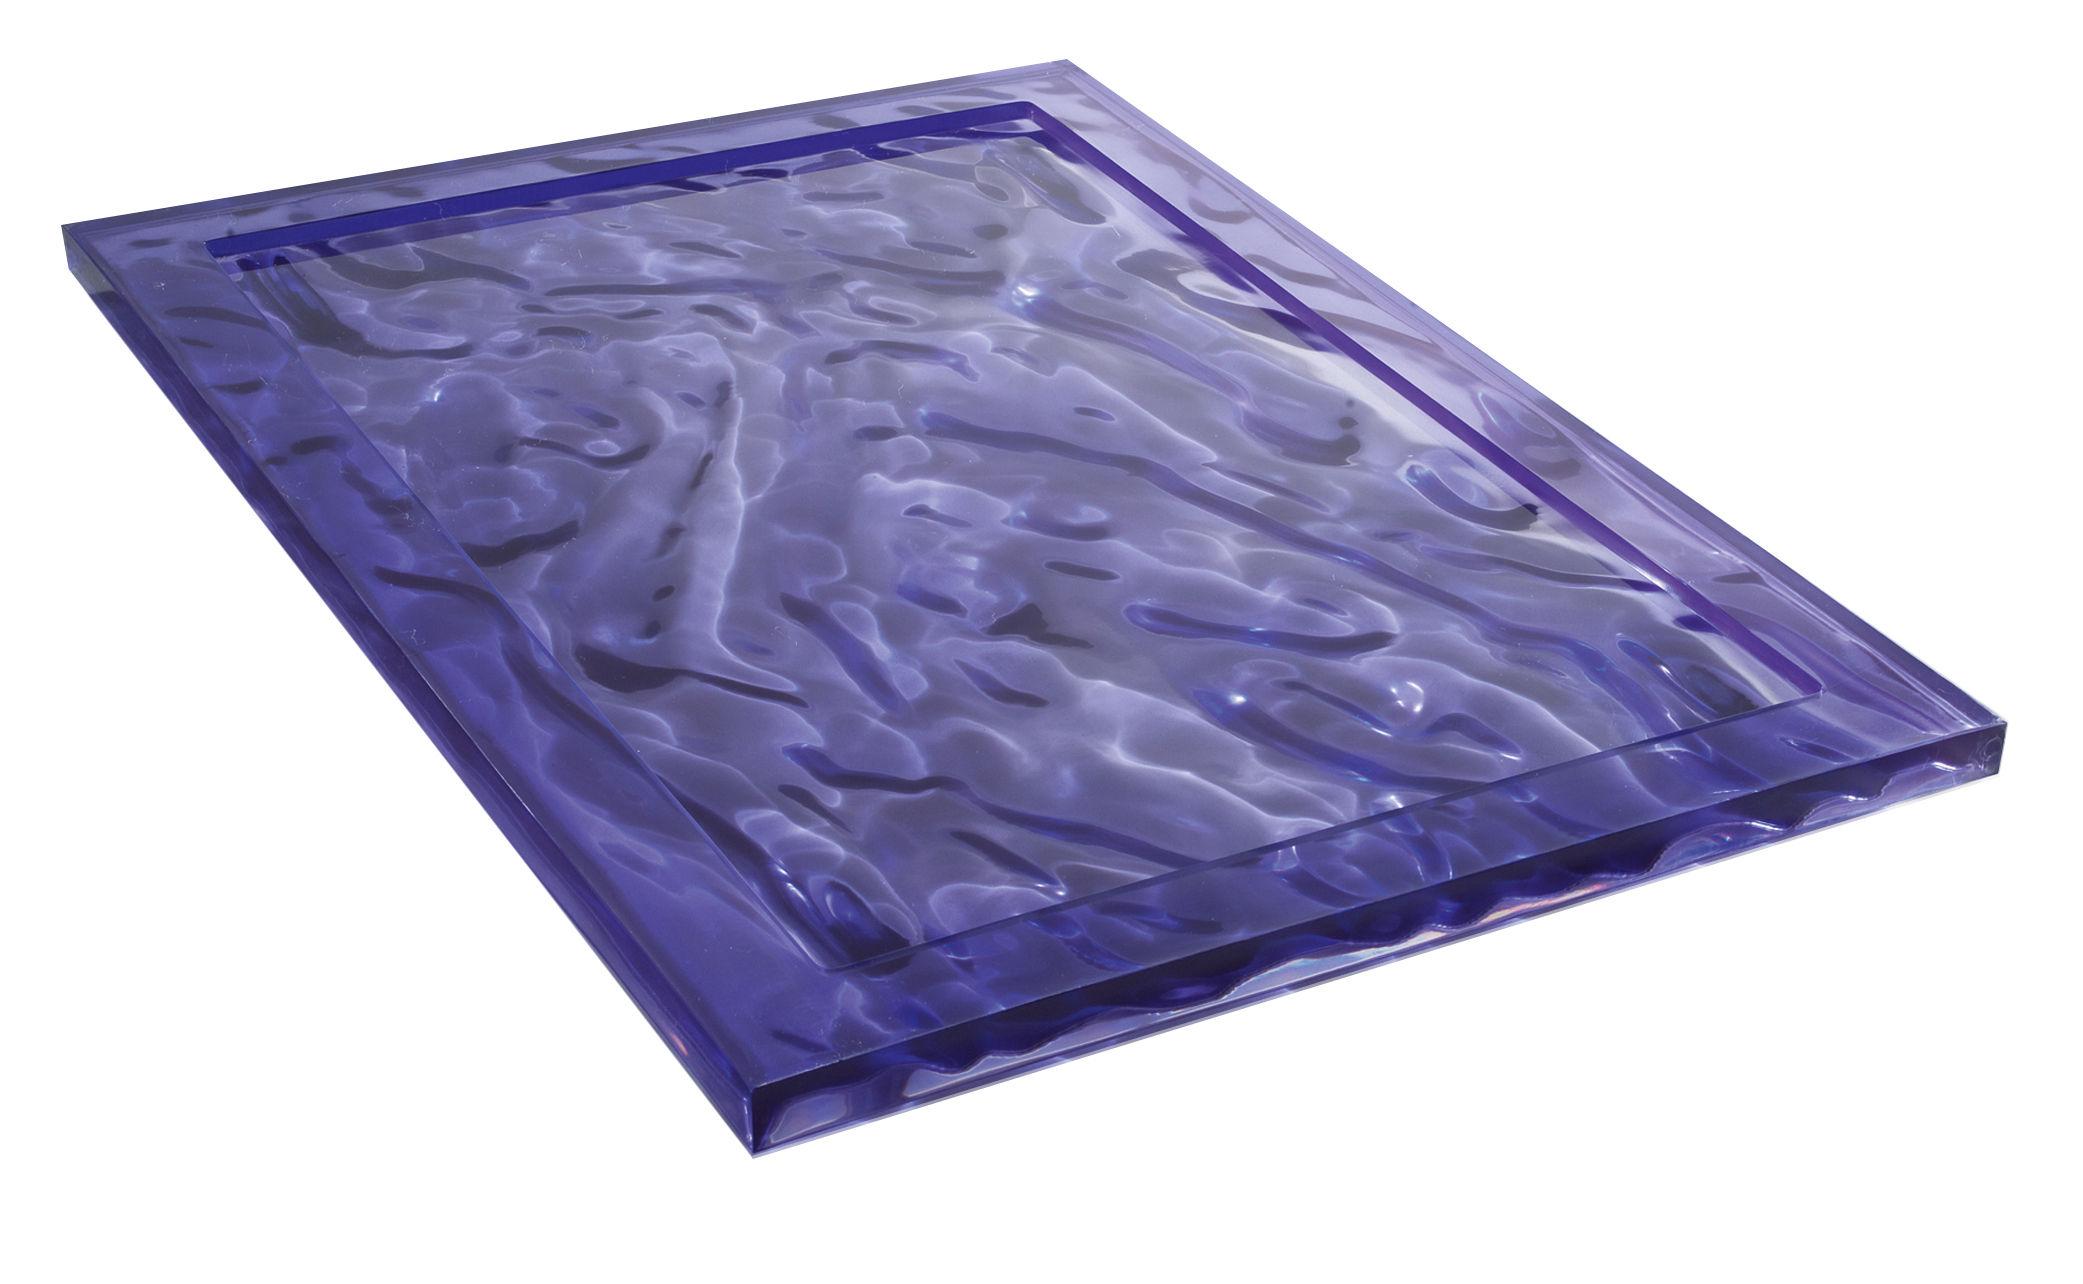 Tableware - Trays - Dune Tray - 46 x 32 cm by Kartell - Fuchsia - Technopolymer